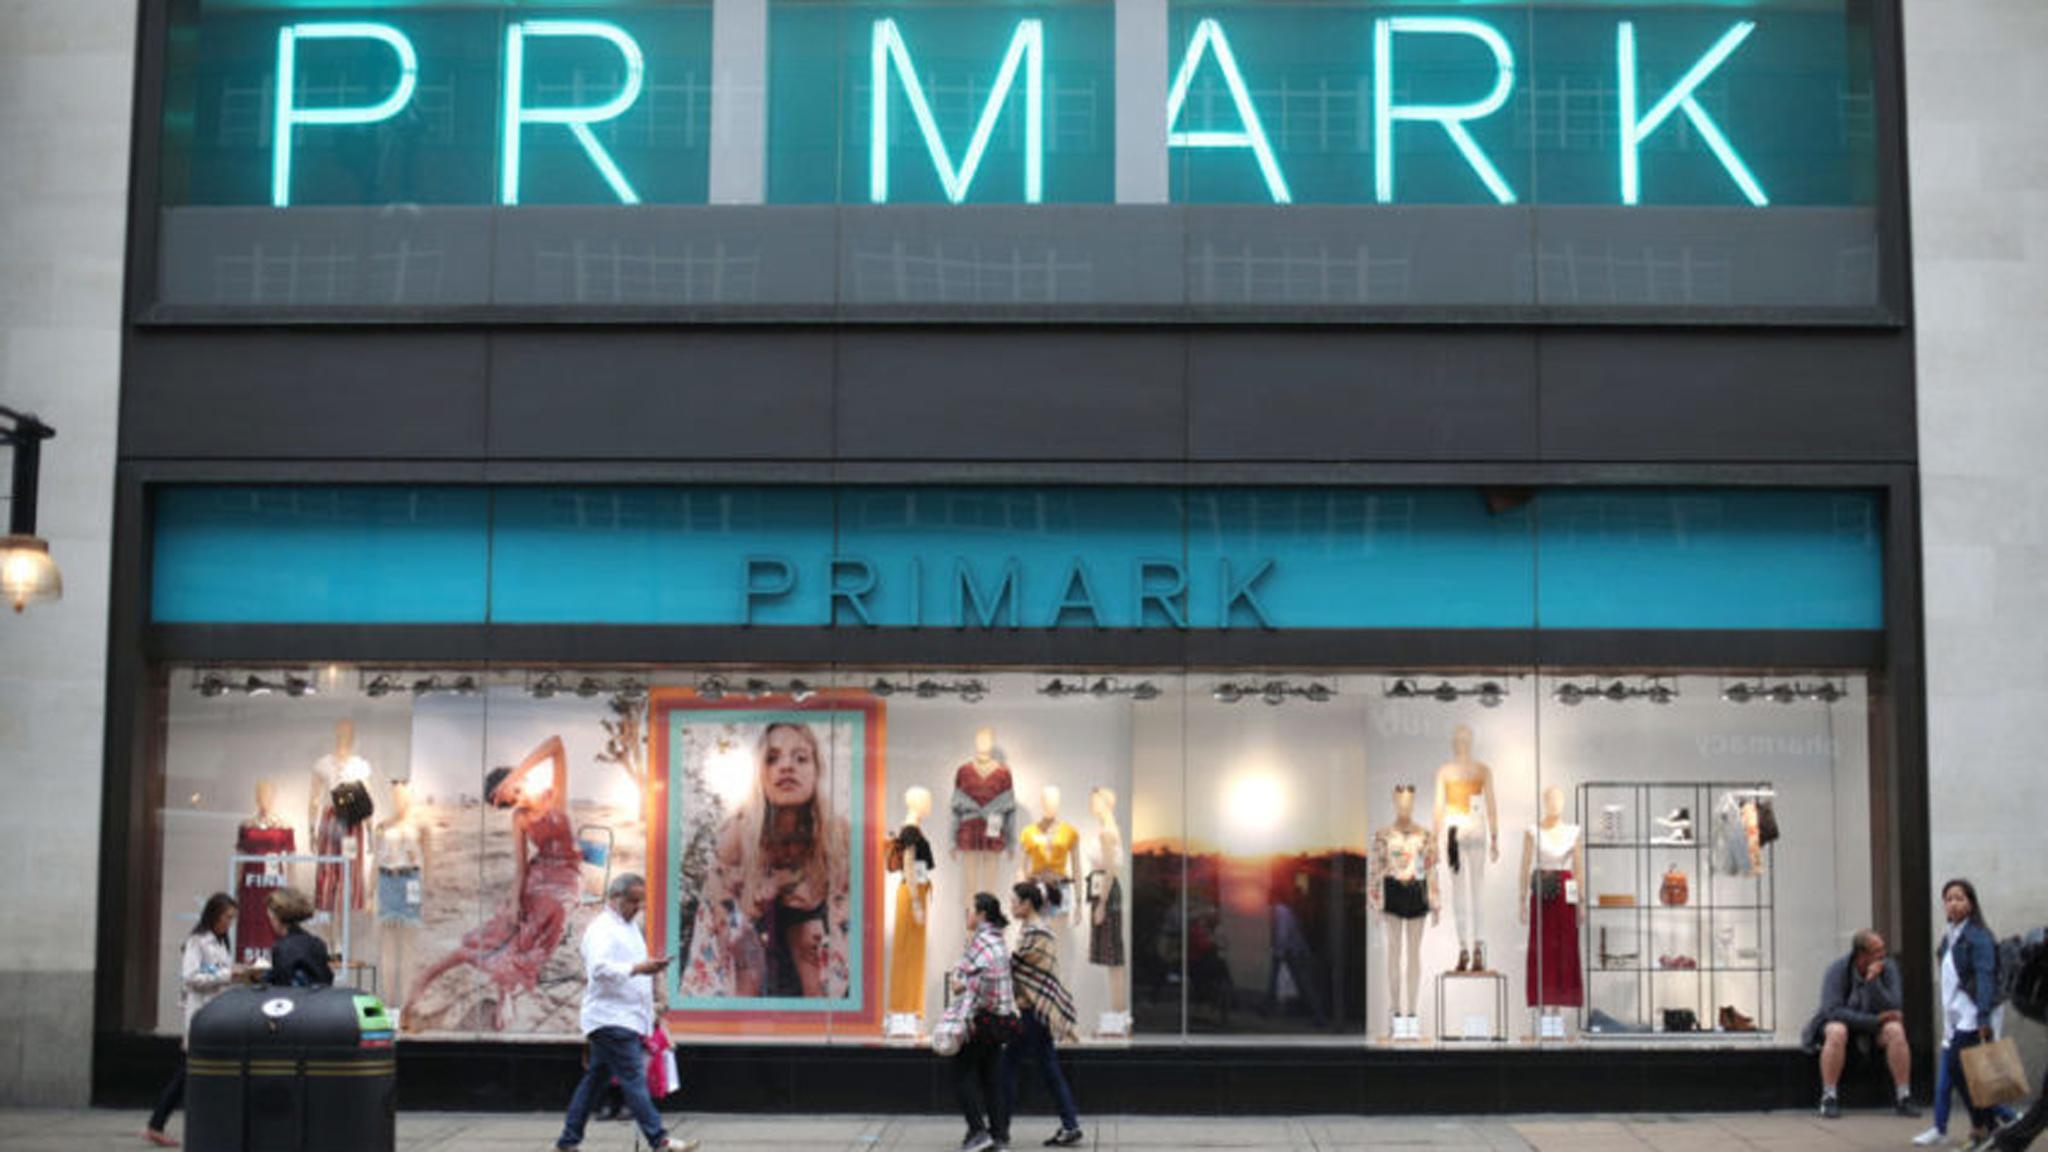 Primark To Repay £121 Million In Furlough Cash Despite Falling Sales